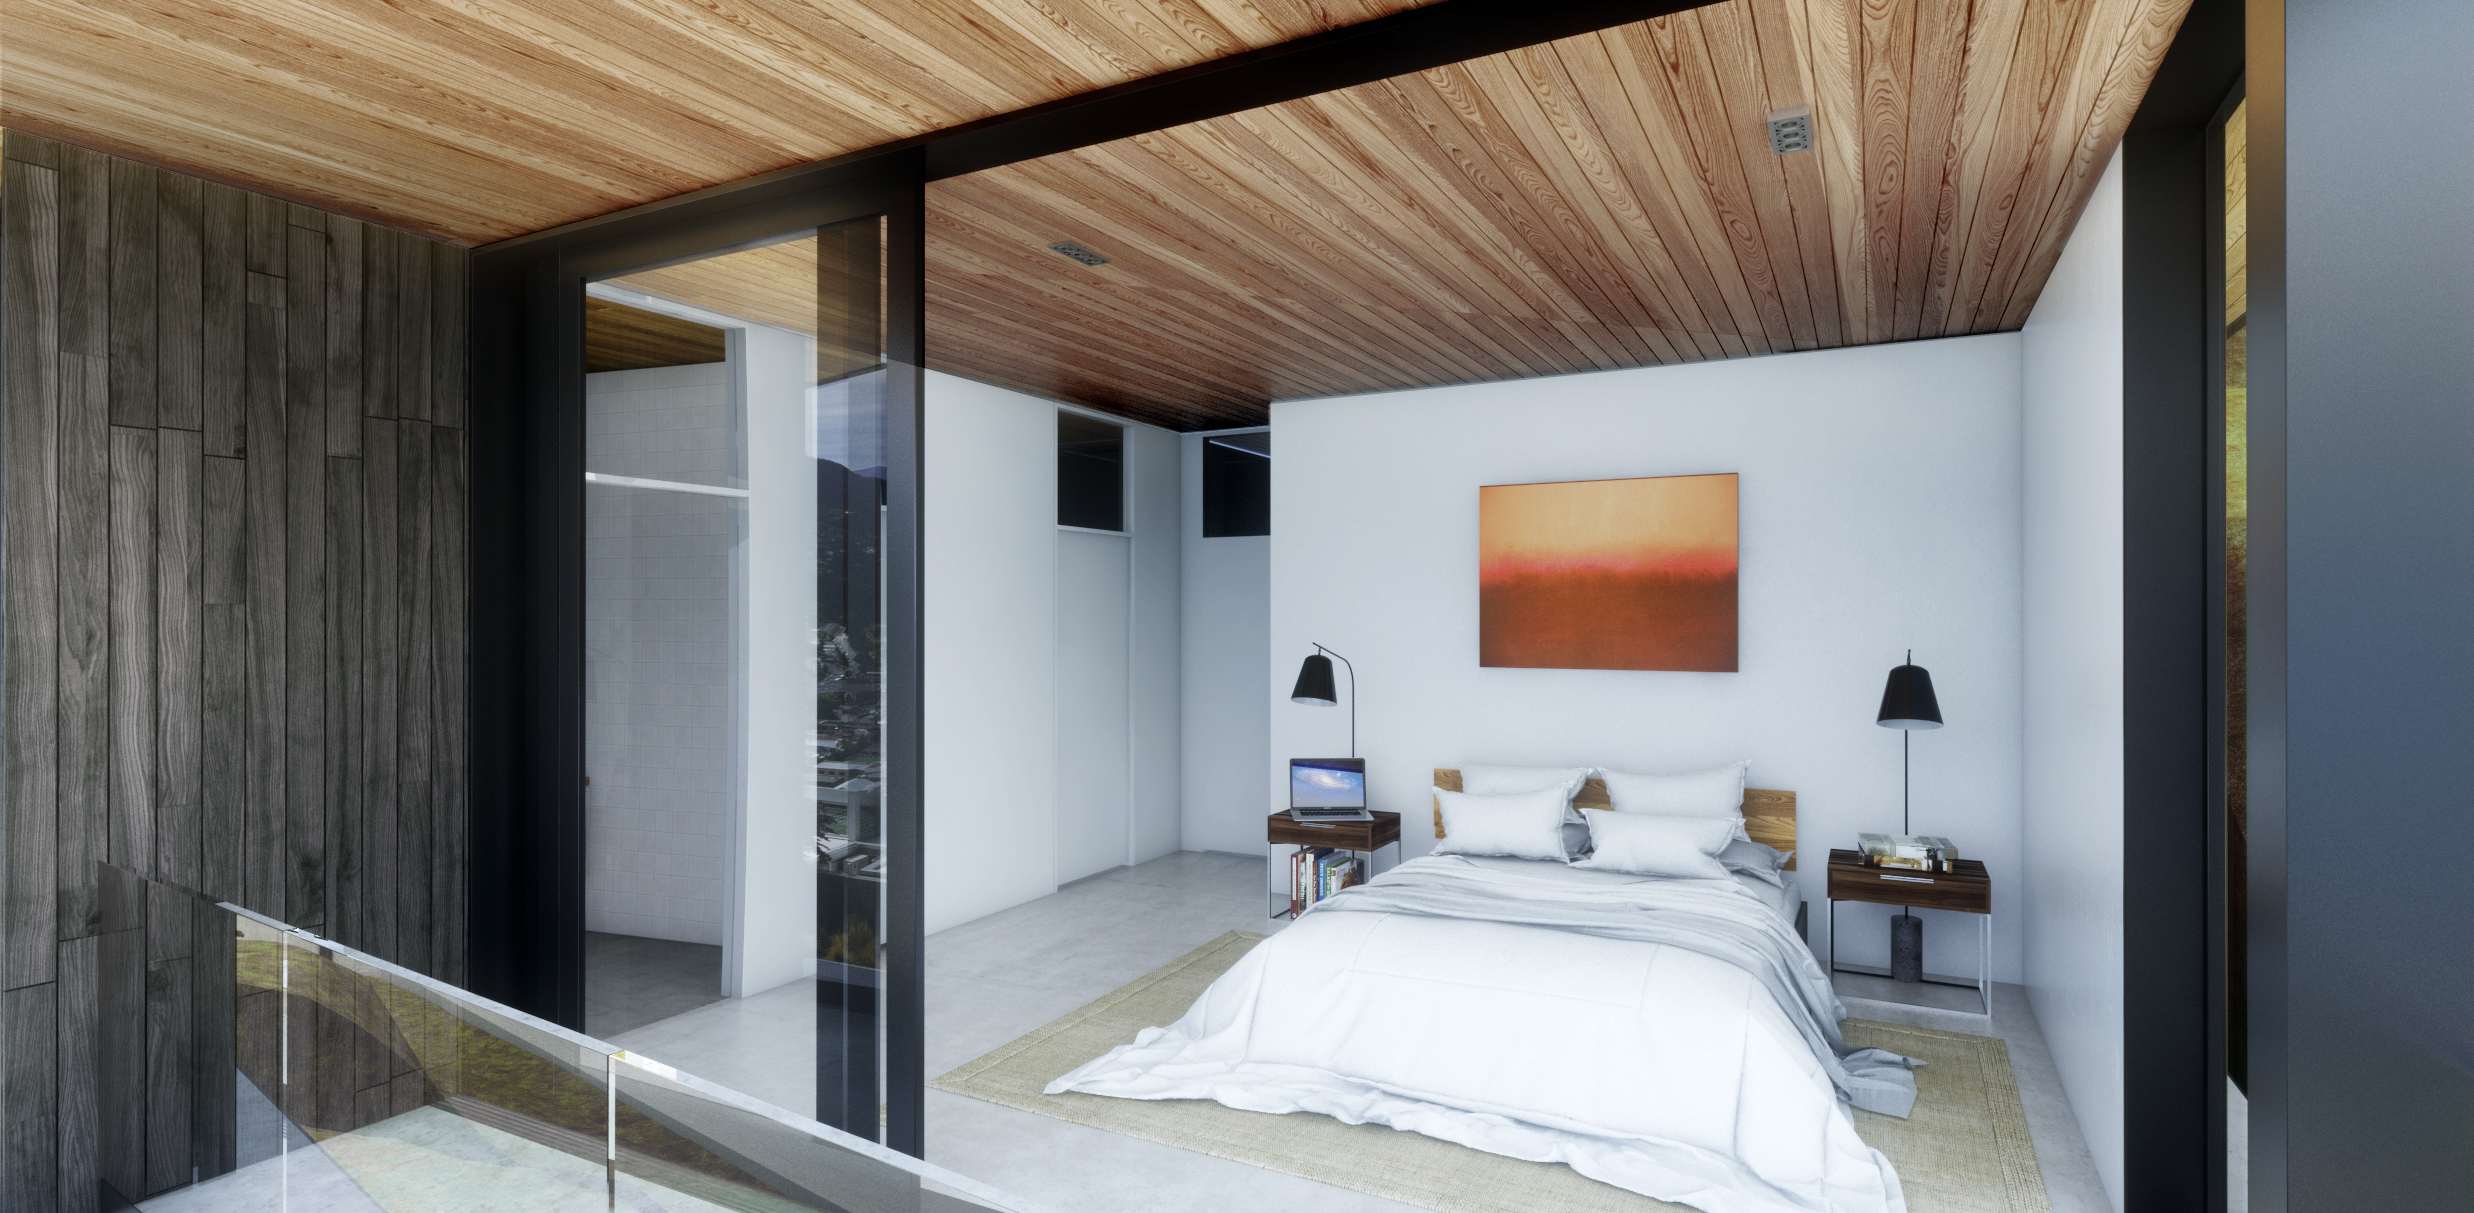 5 Bed.jpg